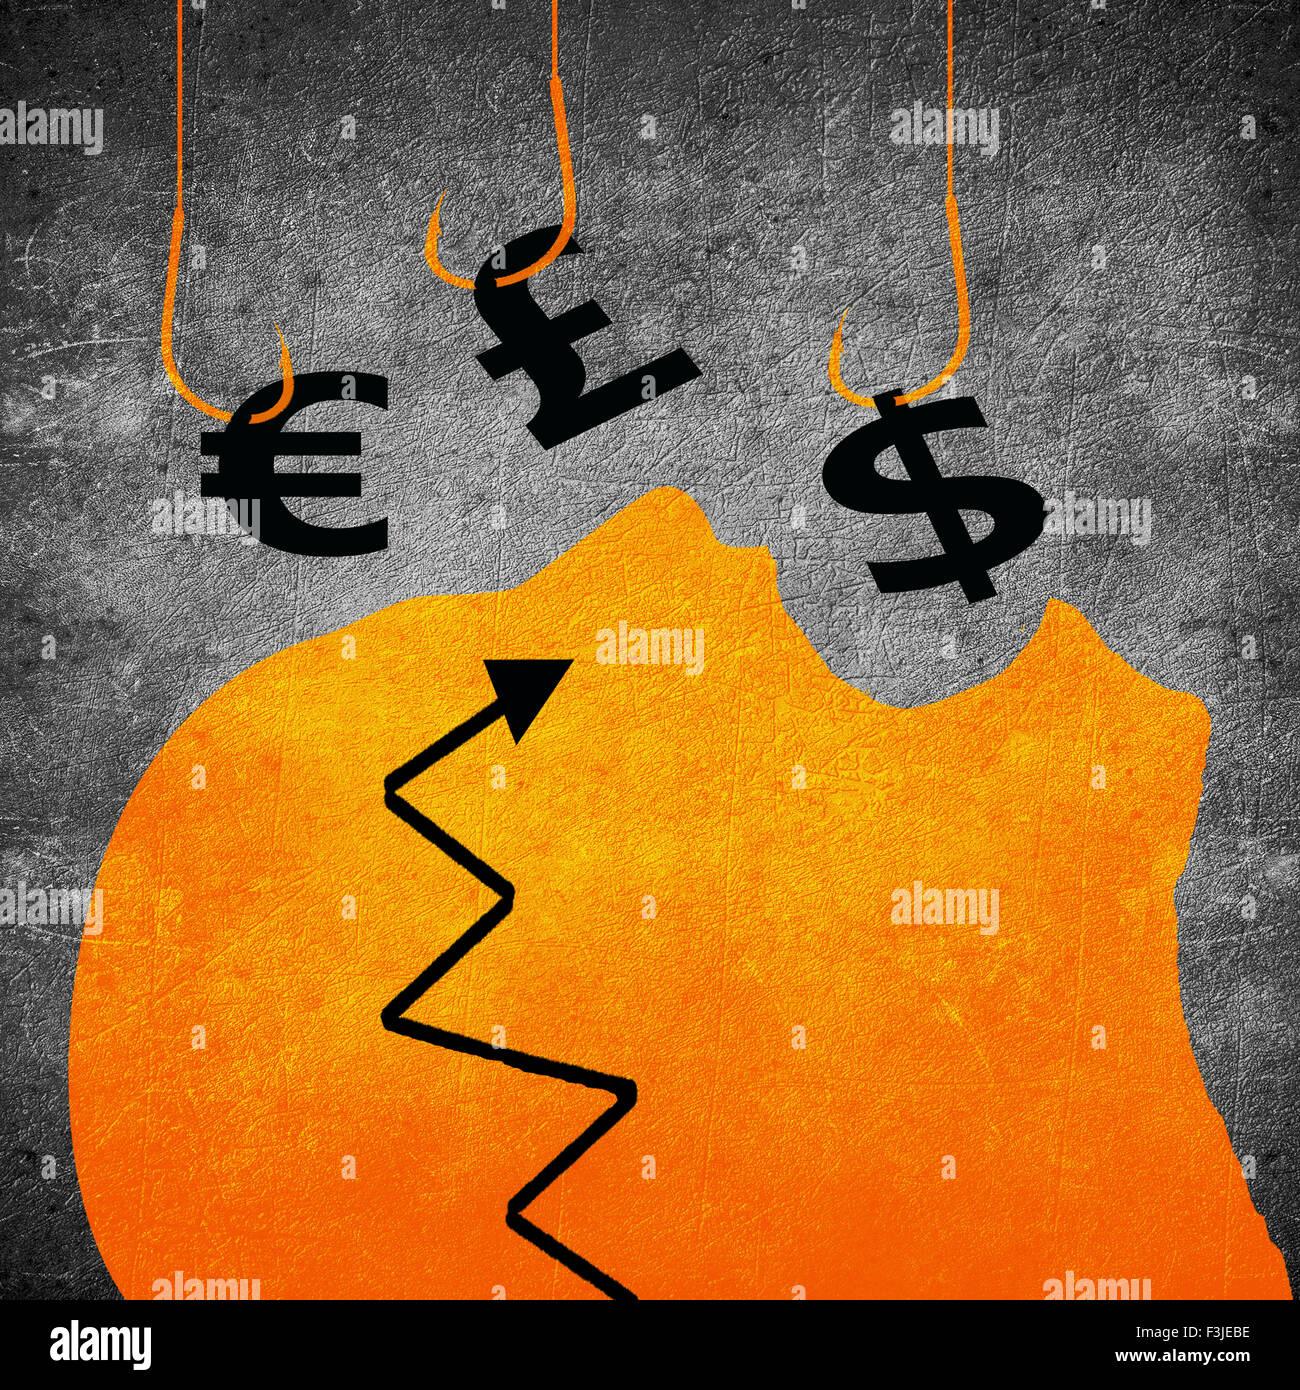 Haken und Geld Symbol Business Konzept digitale Illustration Angeln Stockbild